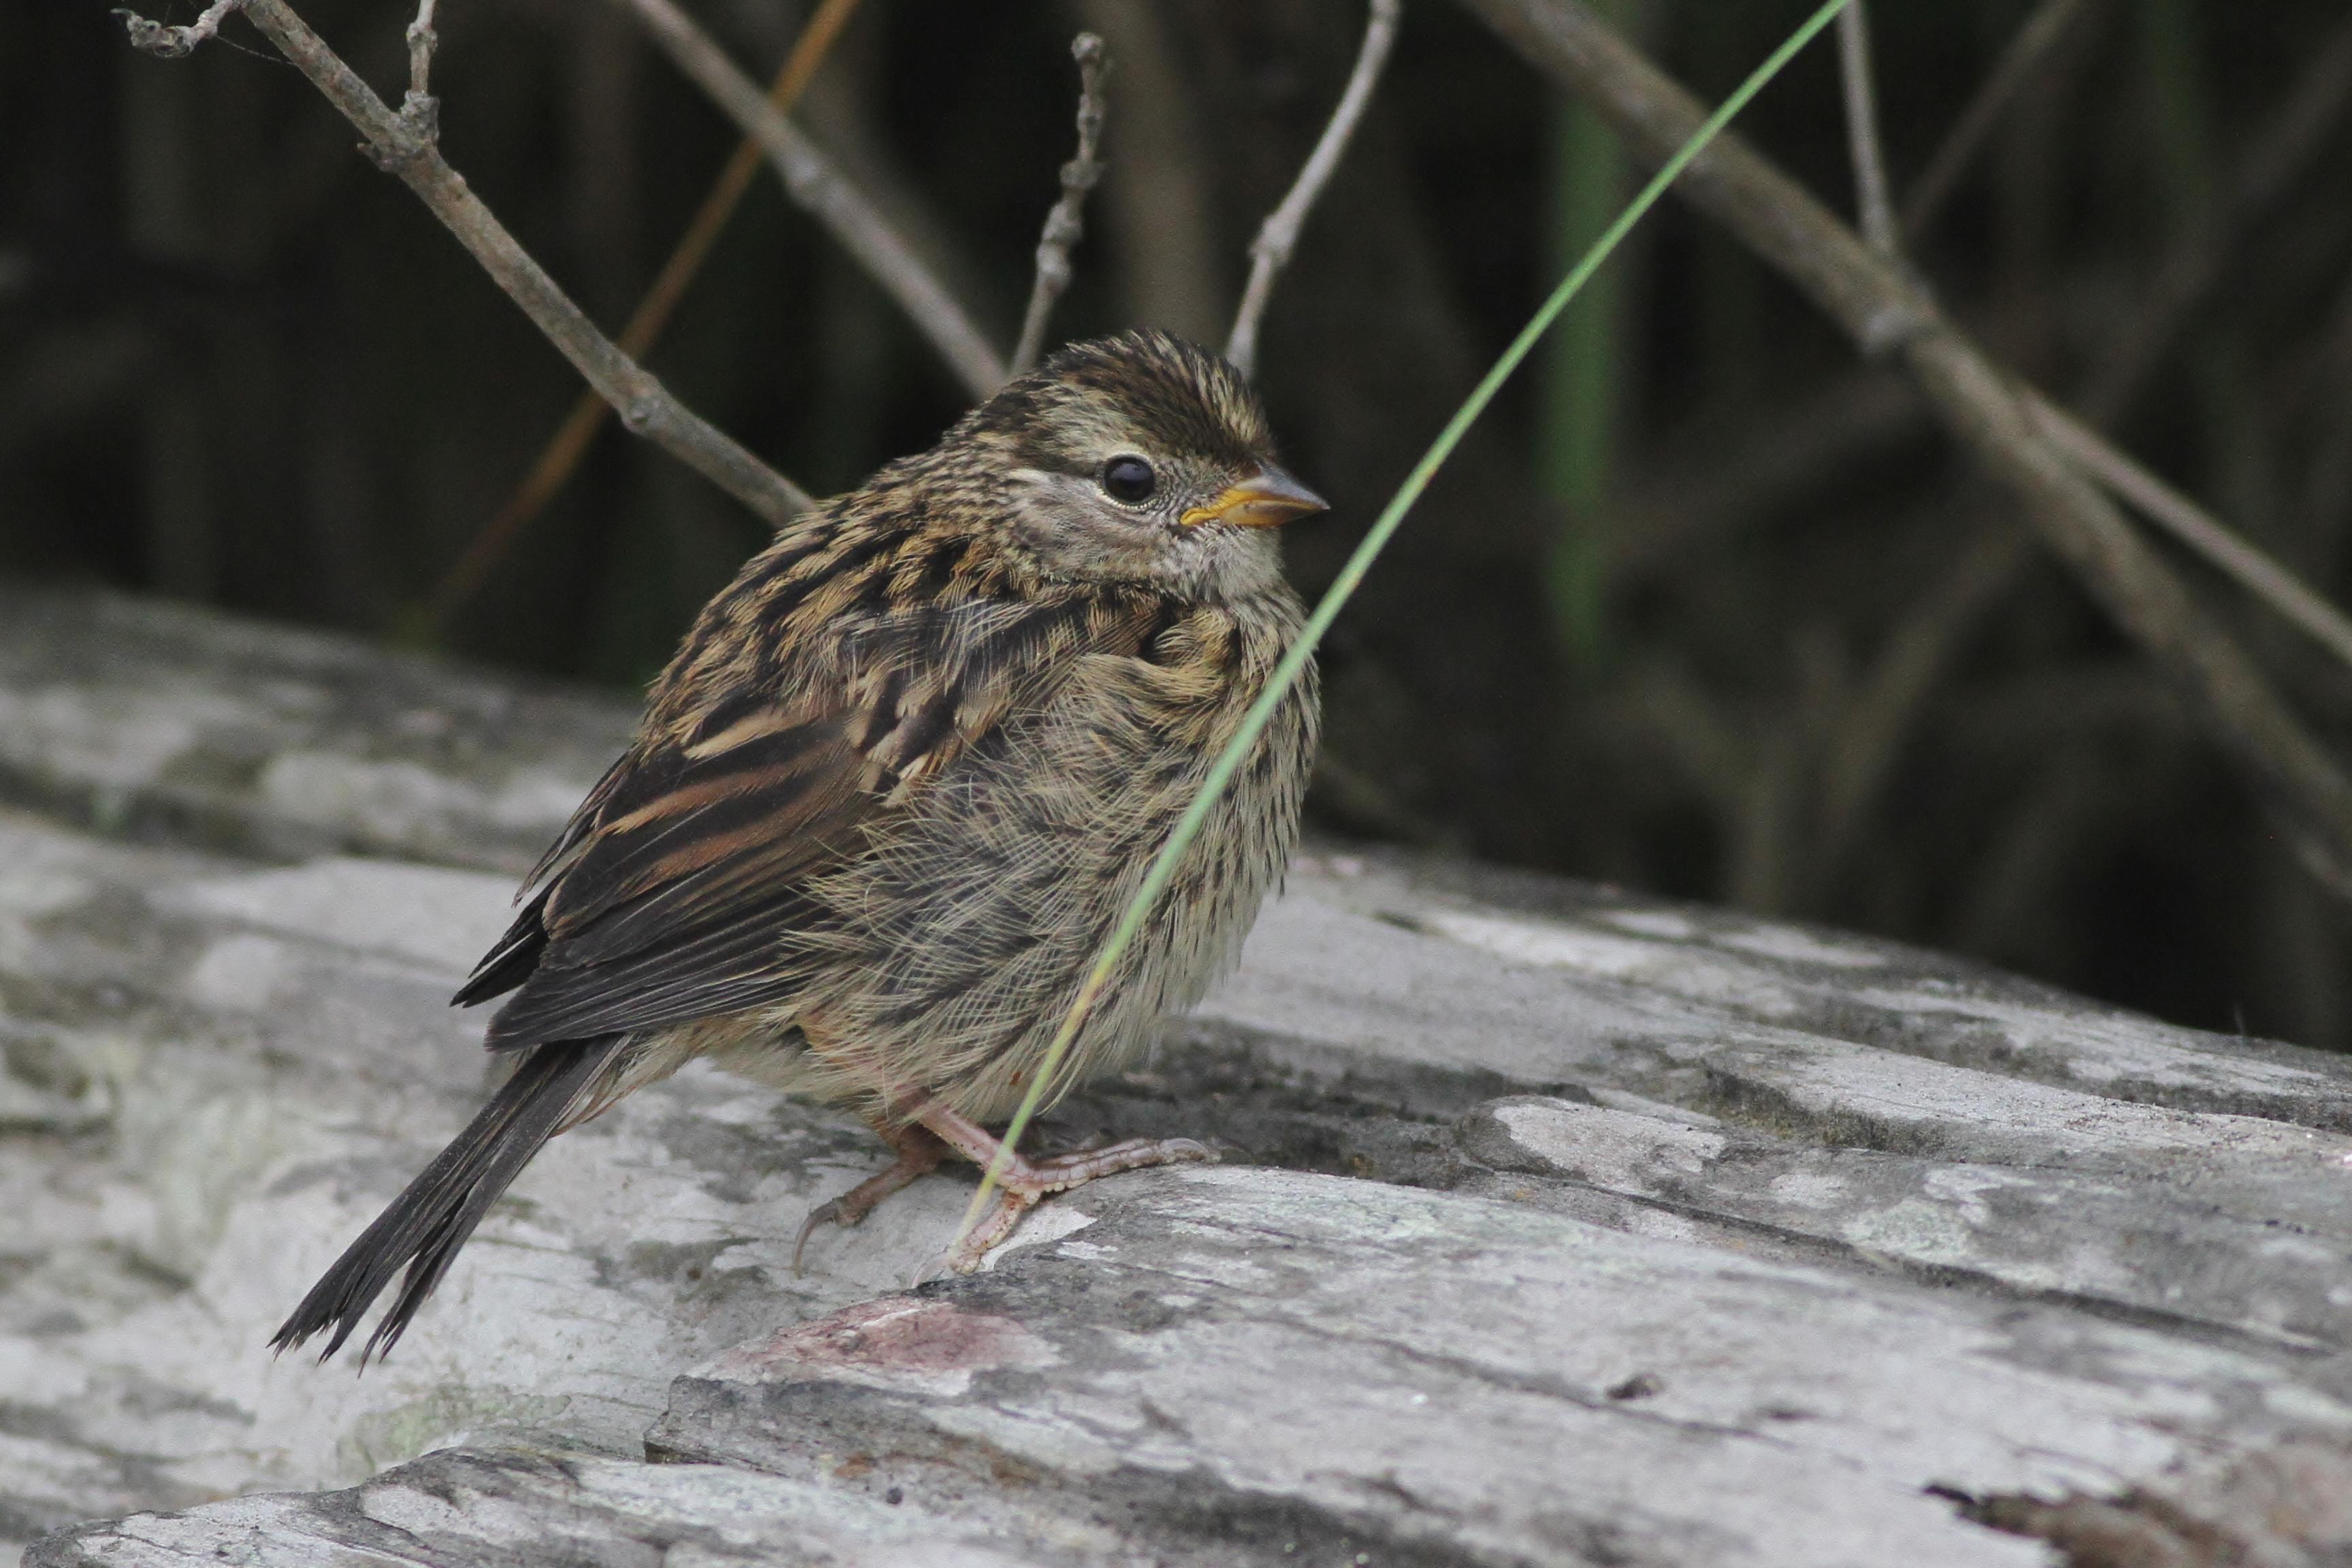 Puget Sound White Crowned Sparrows By Alex Lamoreaux